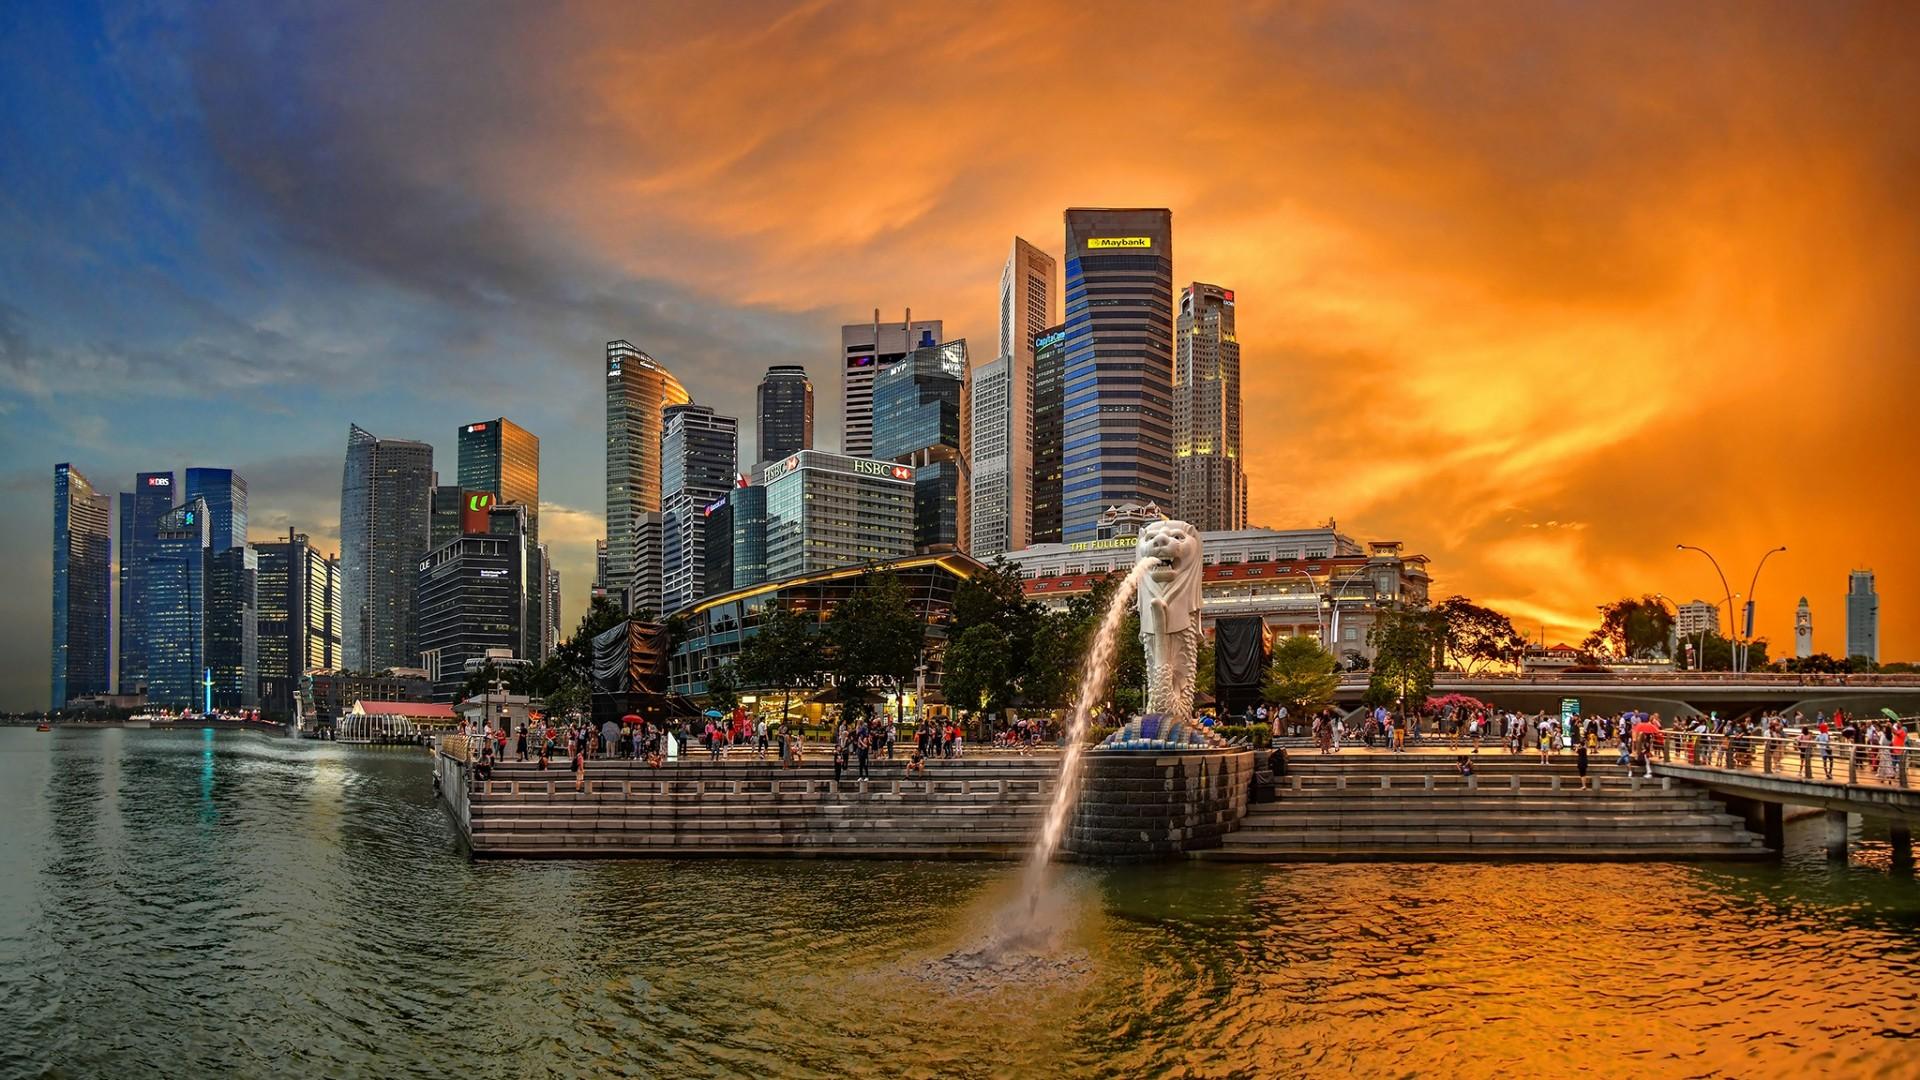 Water-spouting Merlion - Merlion Park, Singapore wallpaper